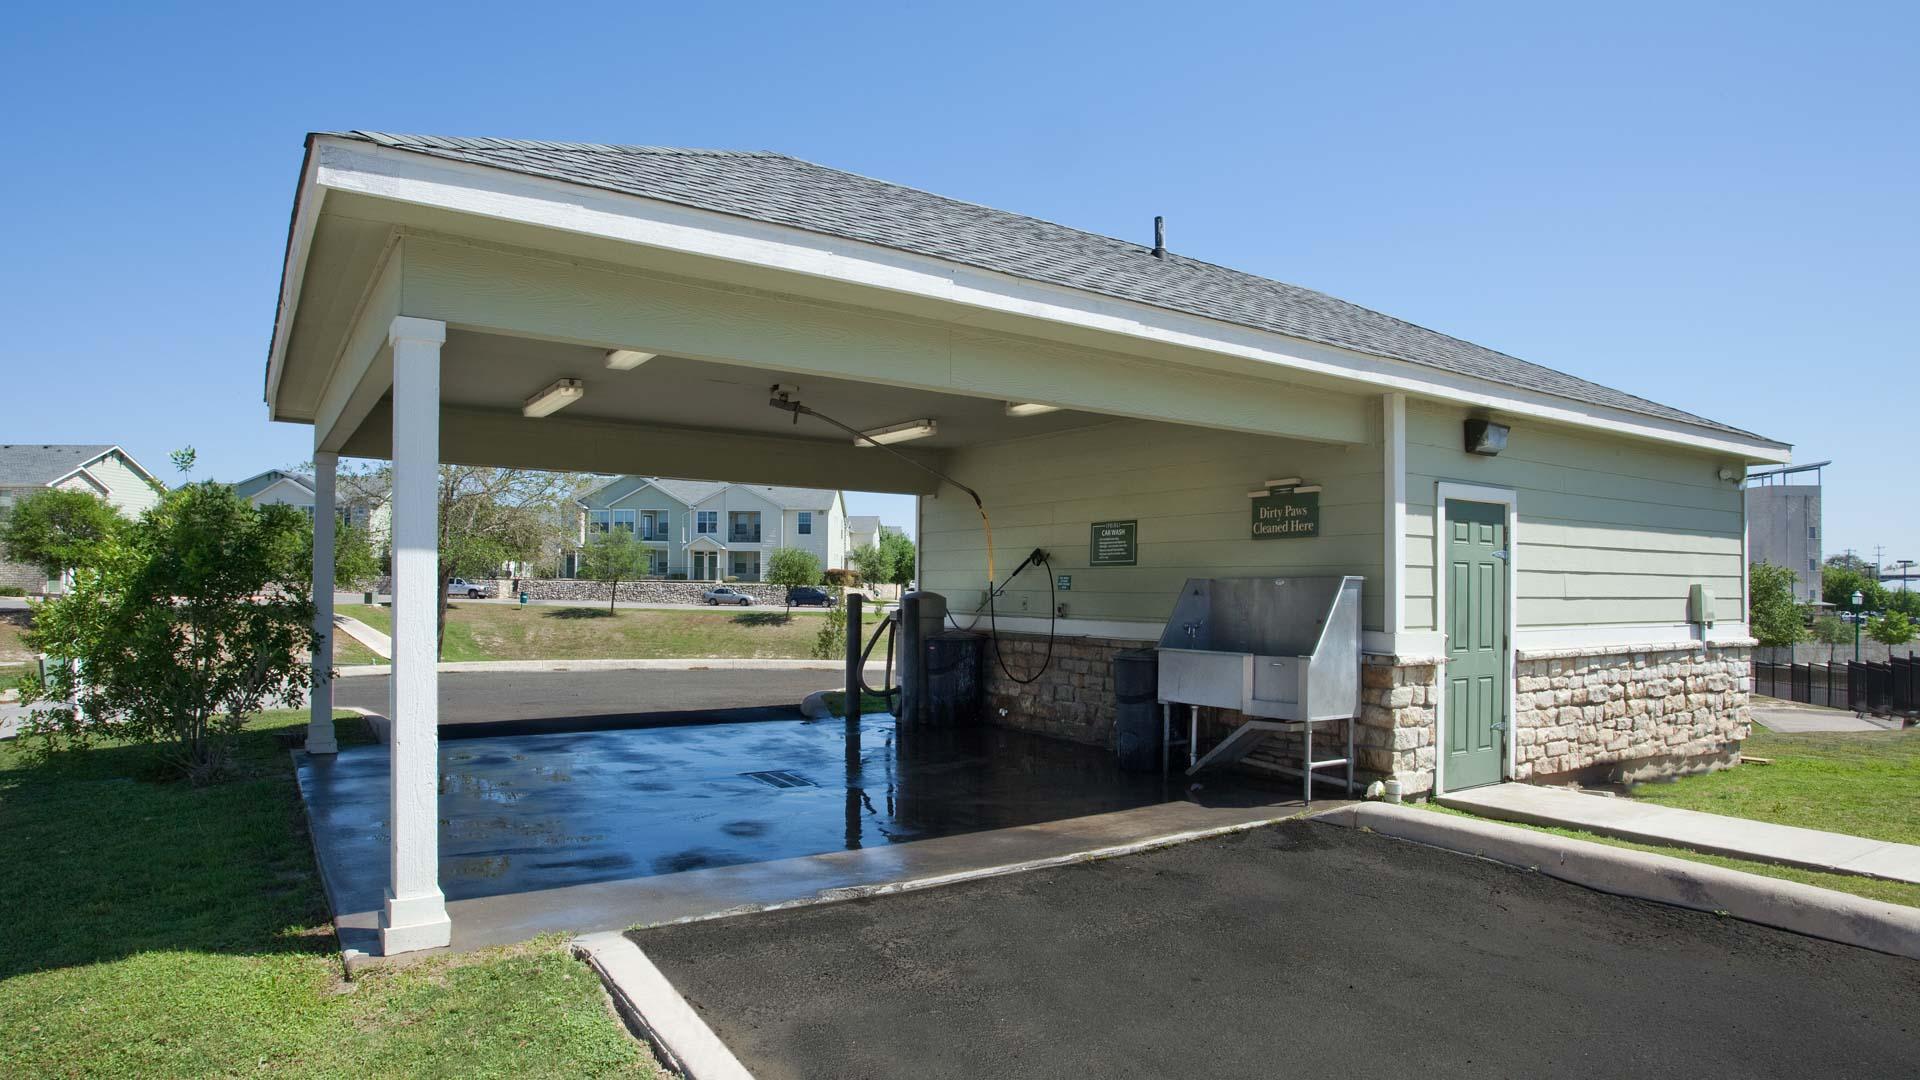 Springs at Live Oak in Live Oak, TX car care center